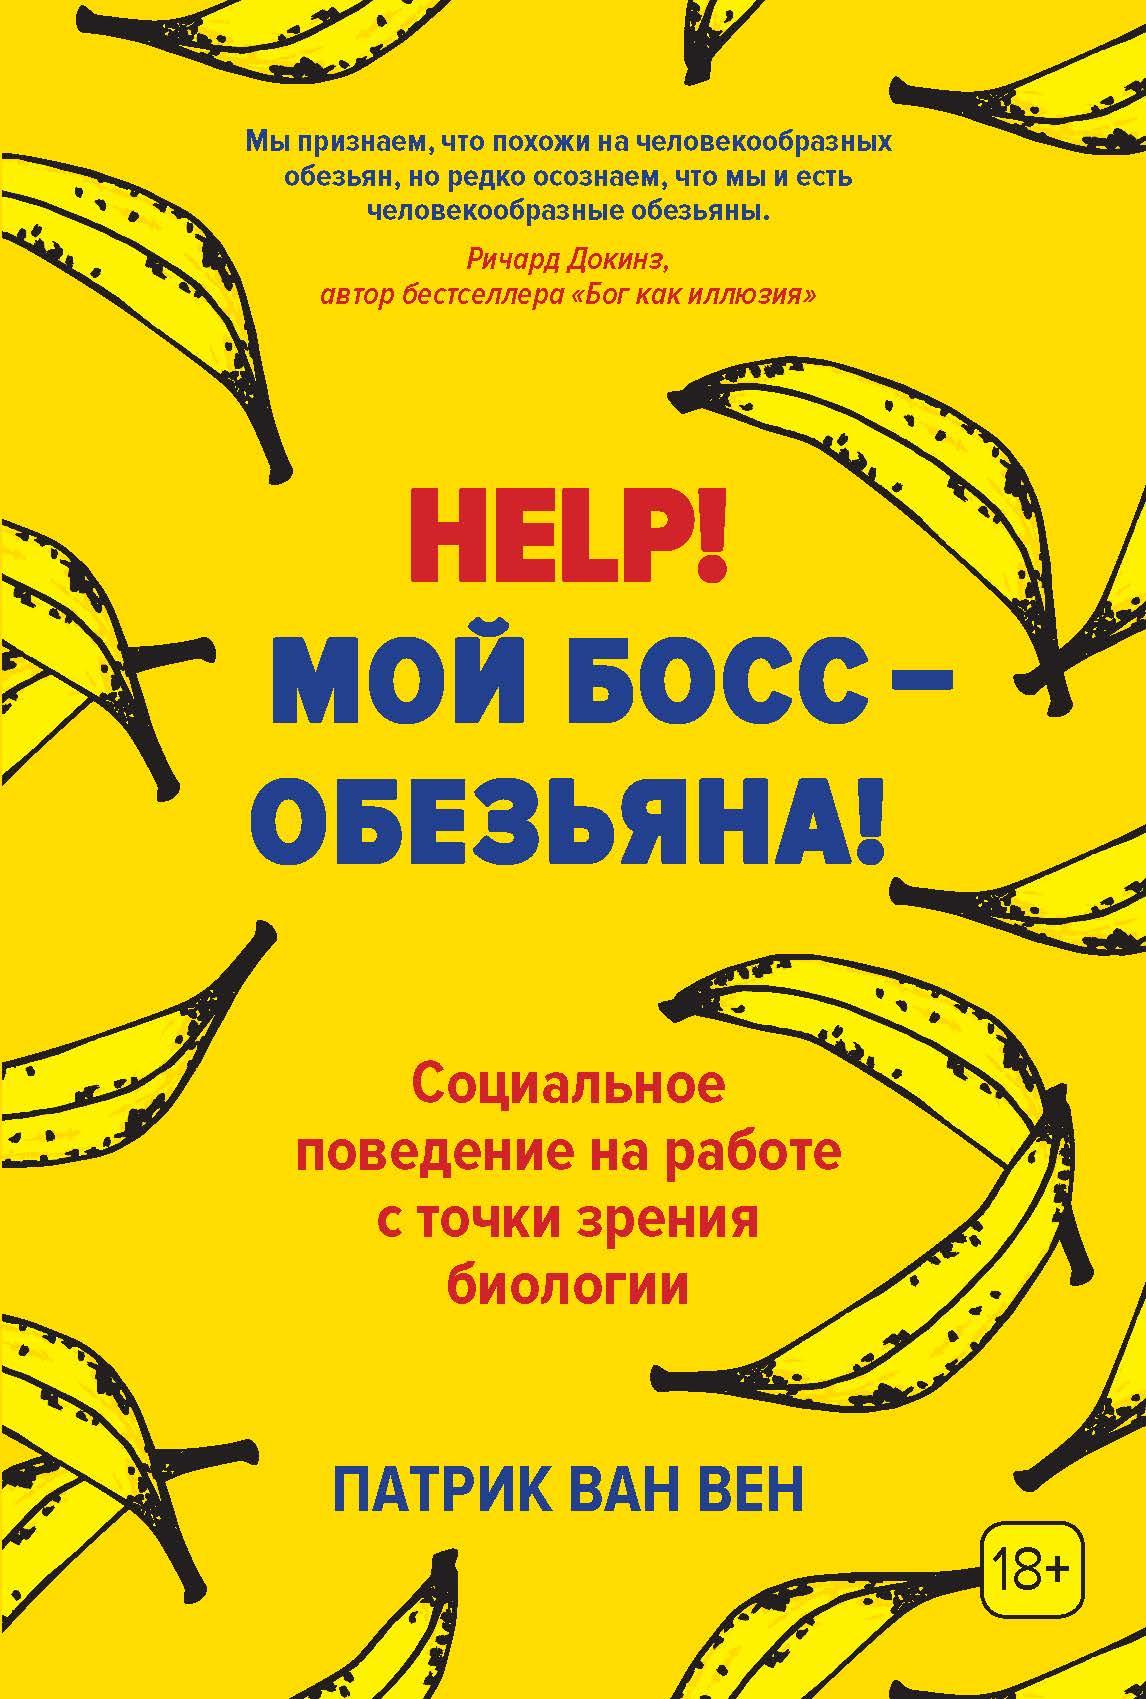 «Help! Мой босс — обезьяна! Социальное поведение на работе с точки зрения биологии» Патрик ван Вен